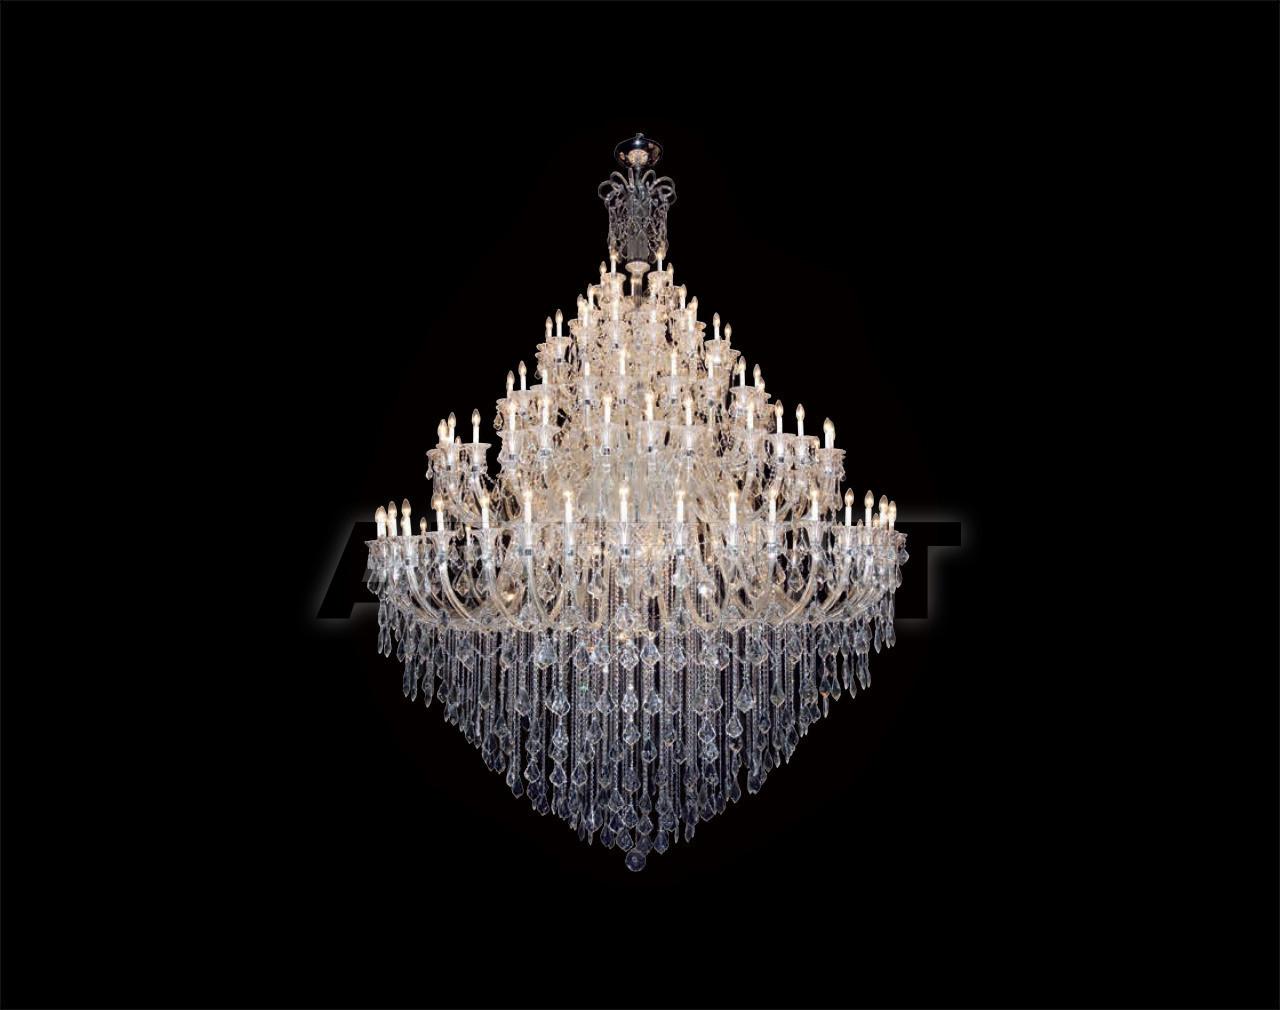 Купить Люстра IMPERIAL Iris Cristal Classic 620140 128